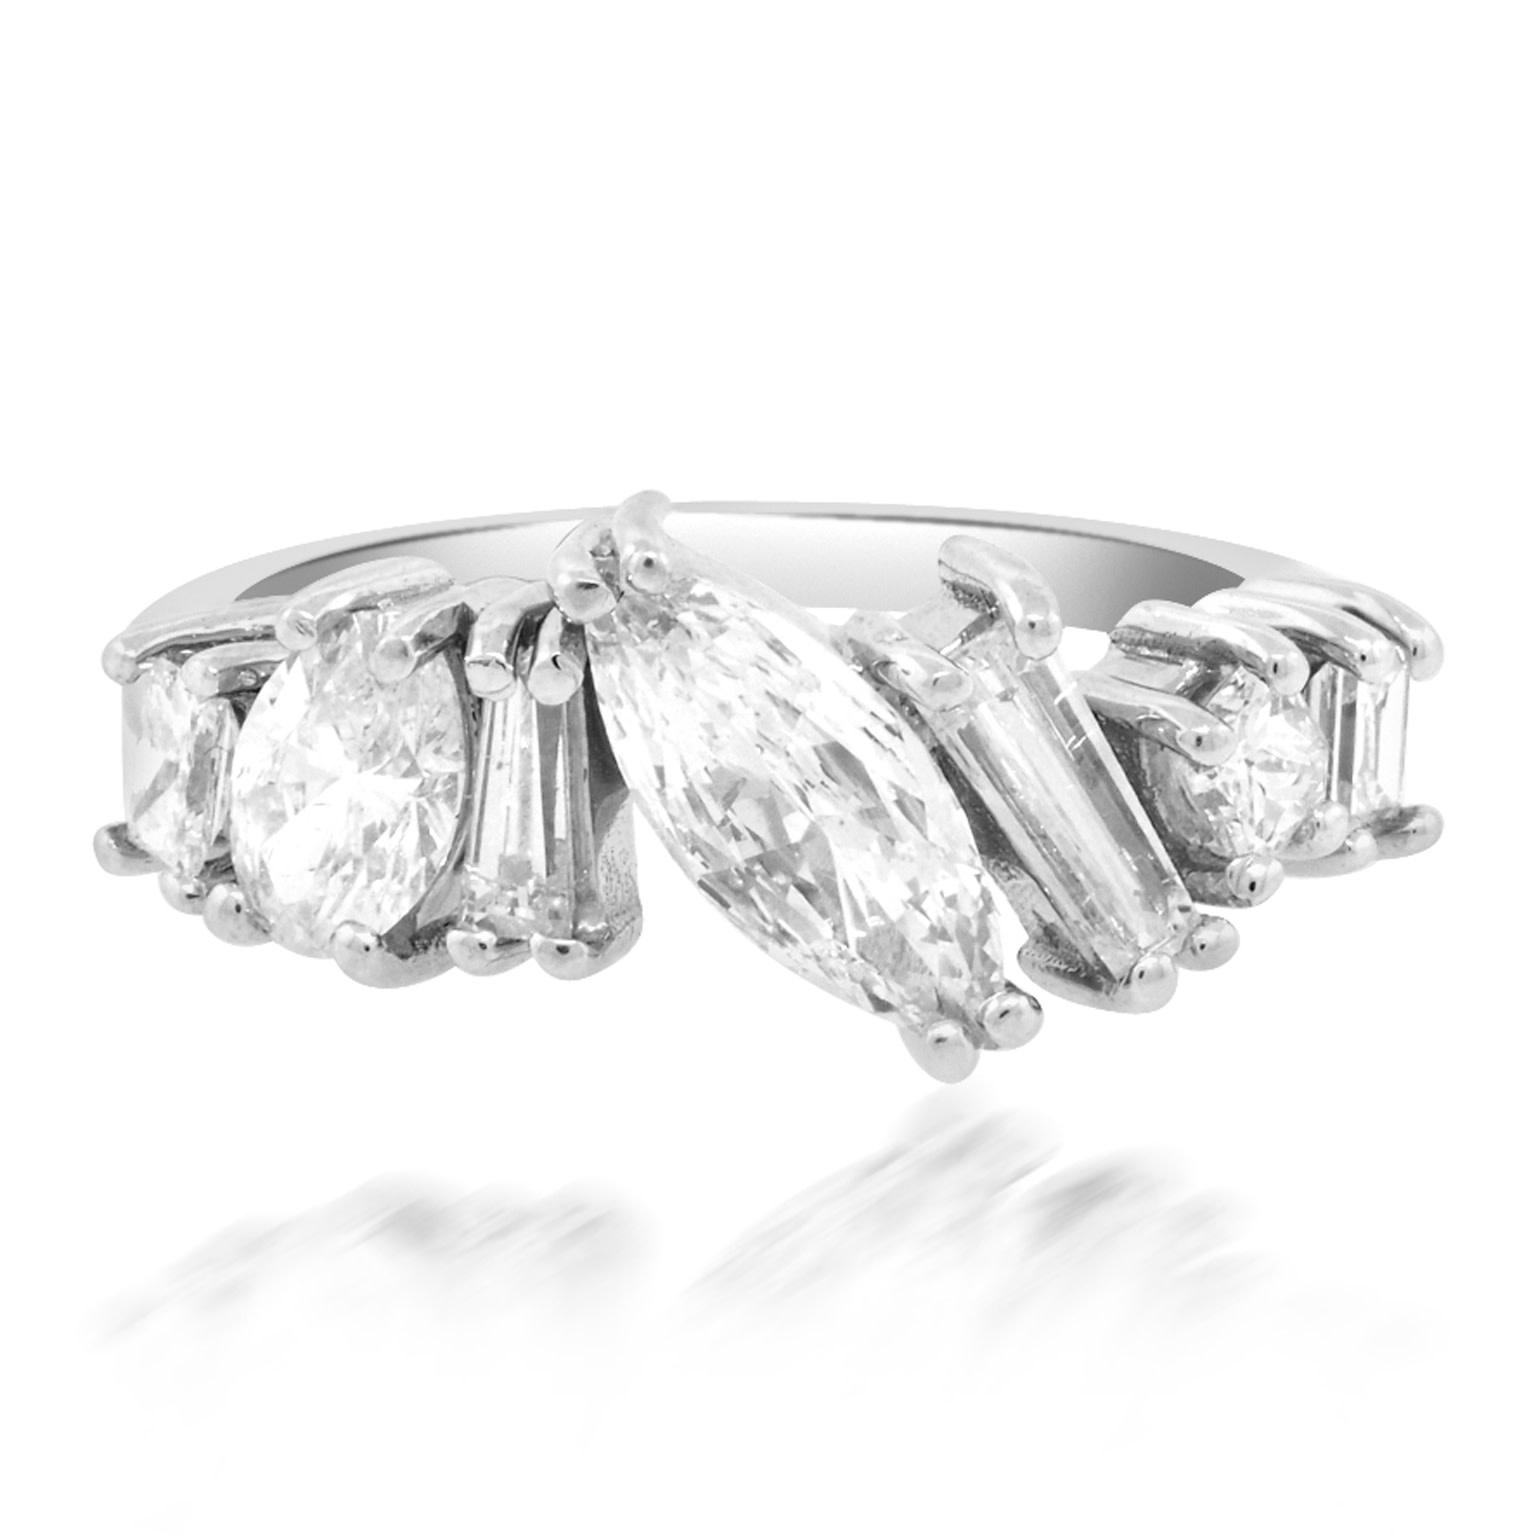 Trabert Goldsmiths Fancy Mixed Cut Diamond White Gold Ring